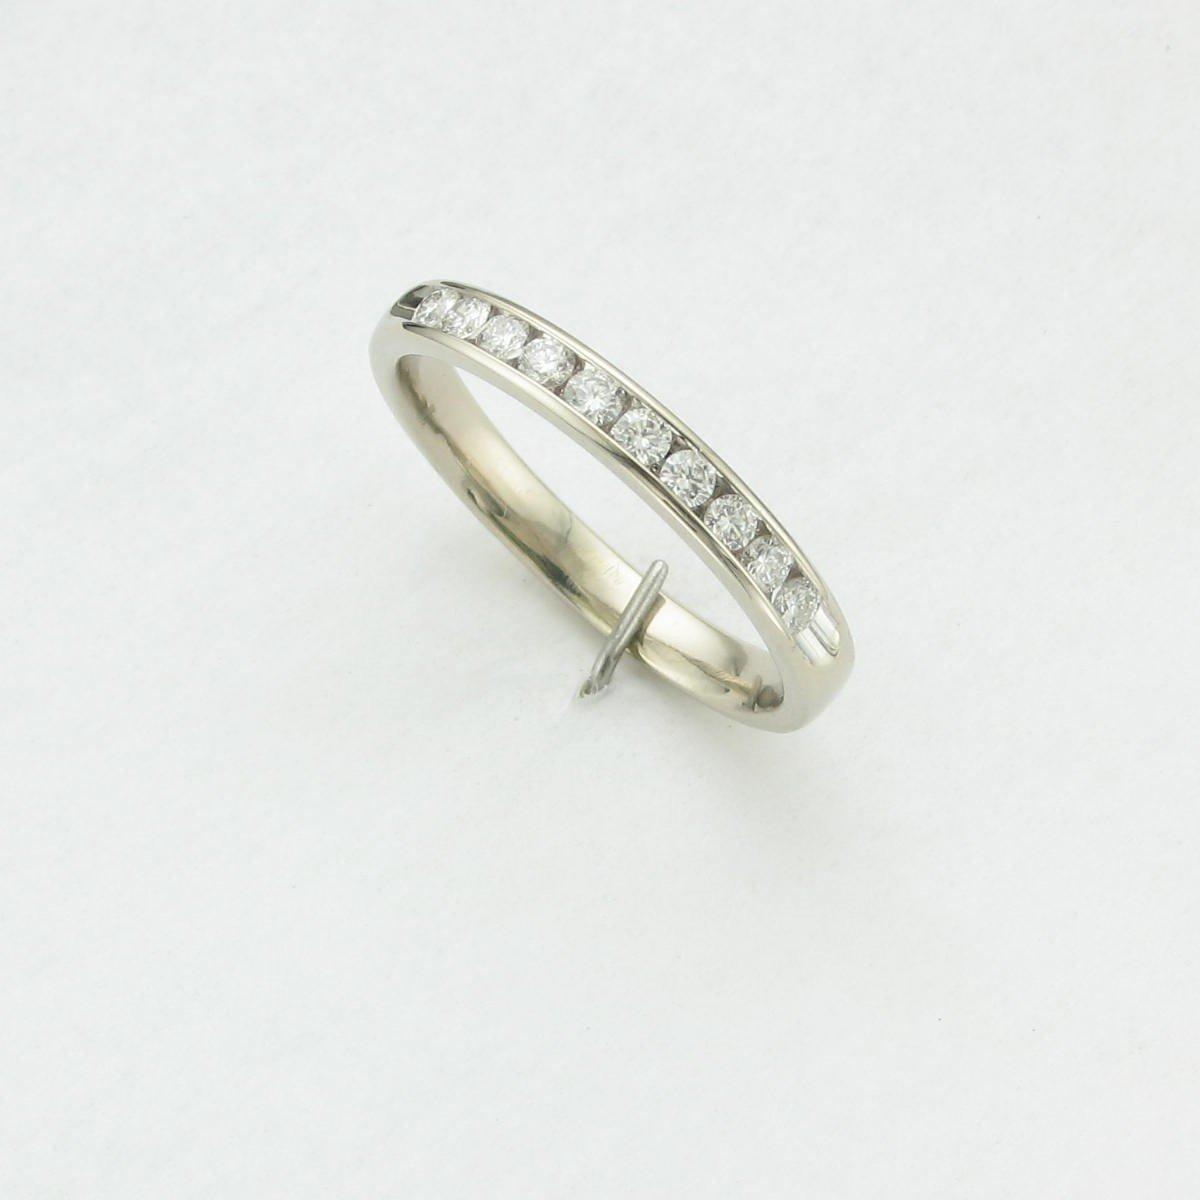 0.20tcw Diamond Band Set in 14 Karat White Gold